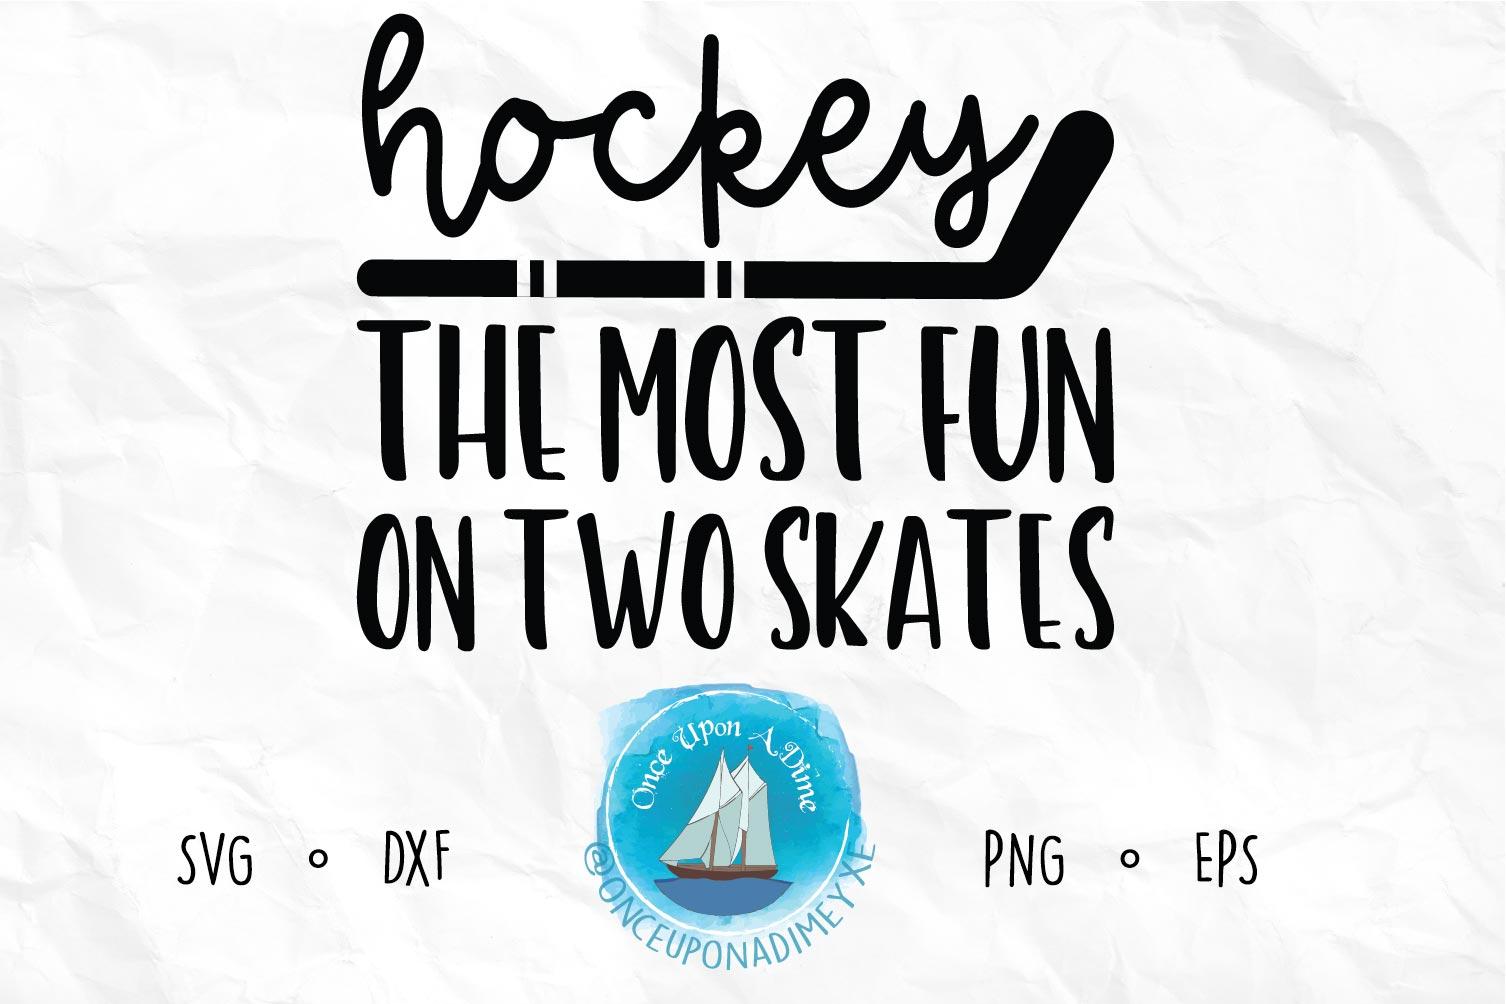 Fun On Two Skates | Hockey | Hockey SVG Cut File example image 1